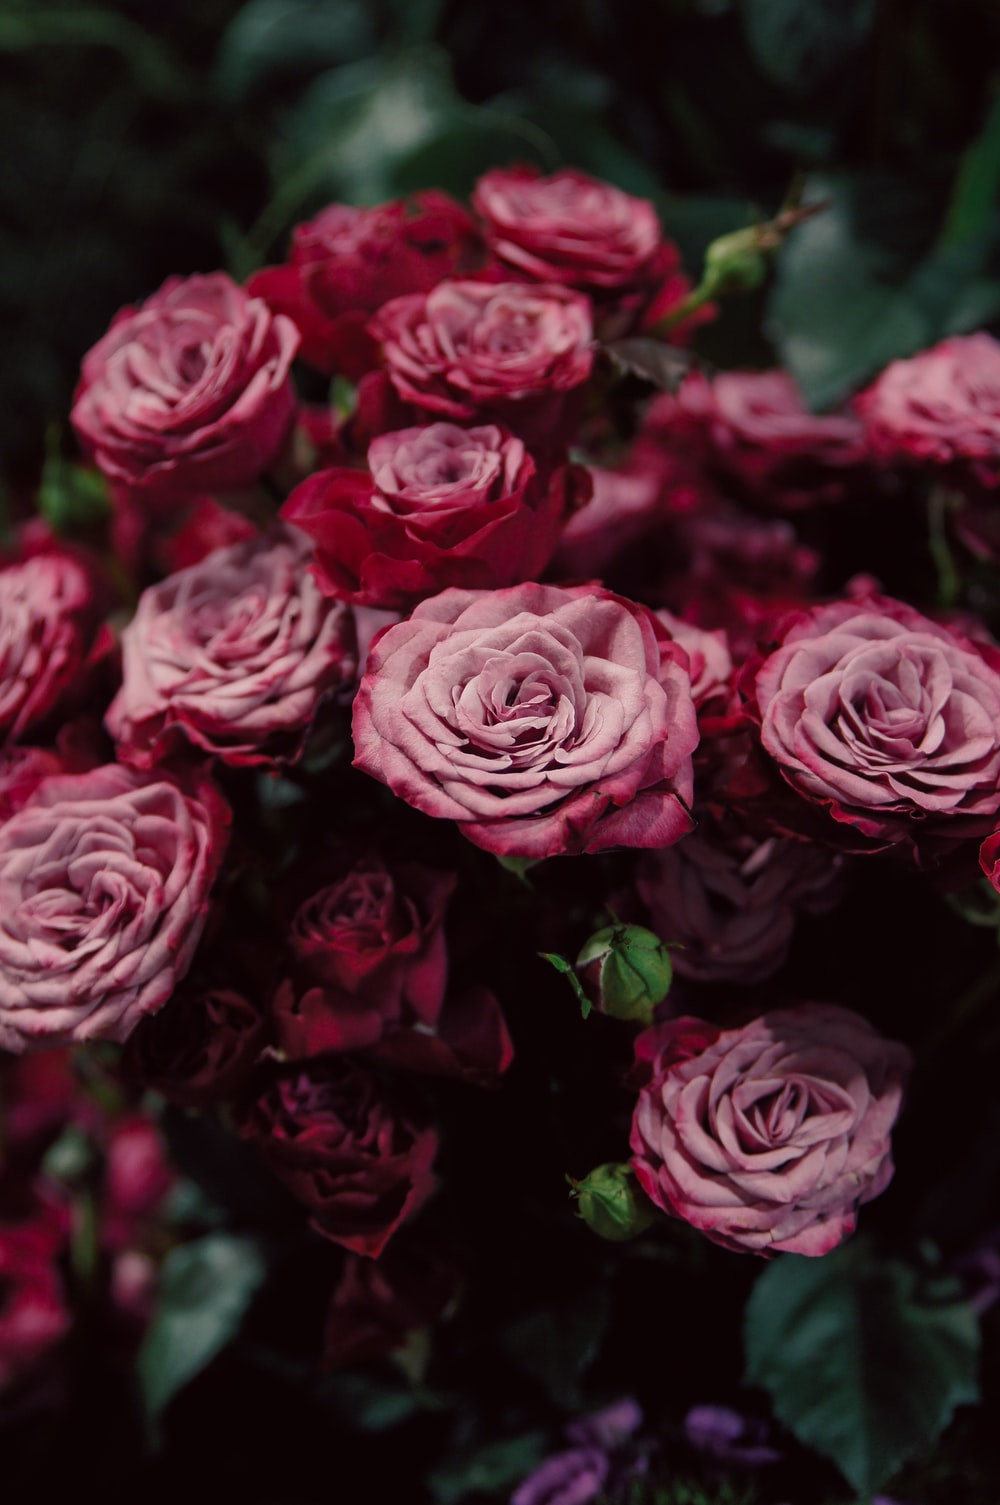 500 Flora Pictures Download Free Images On Unsplash